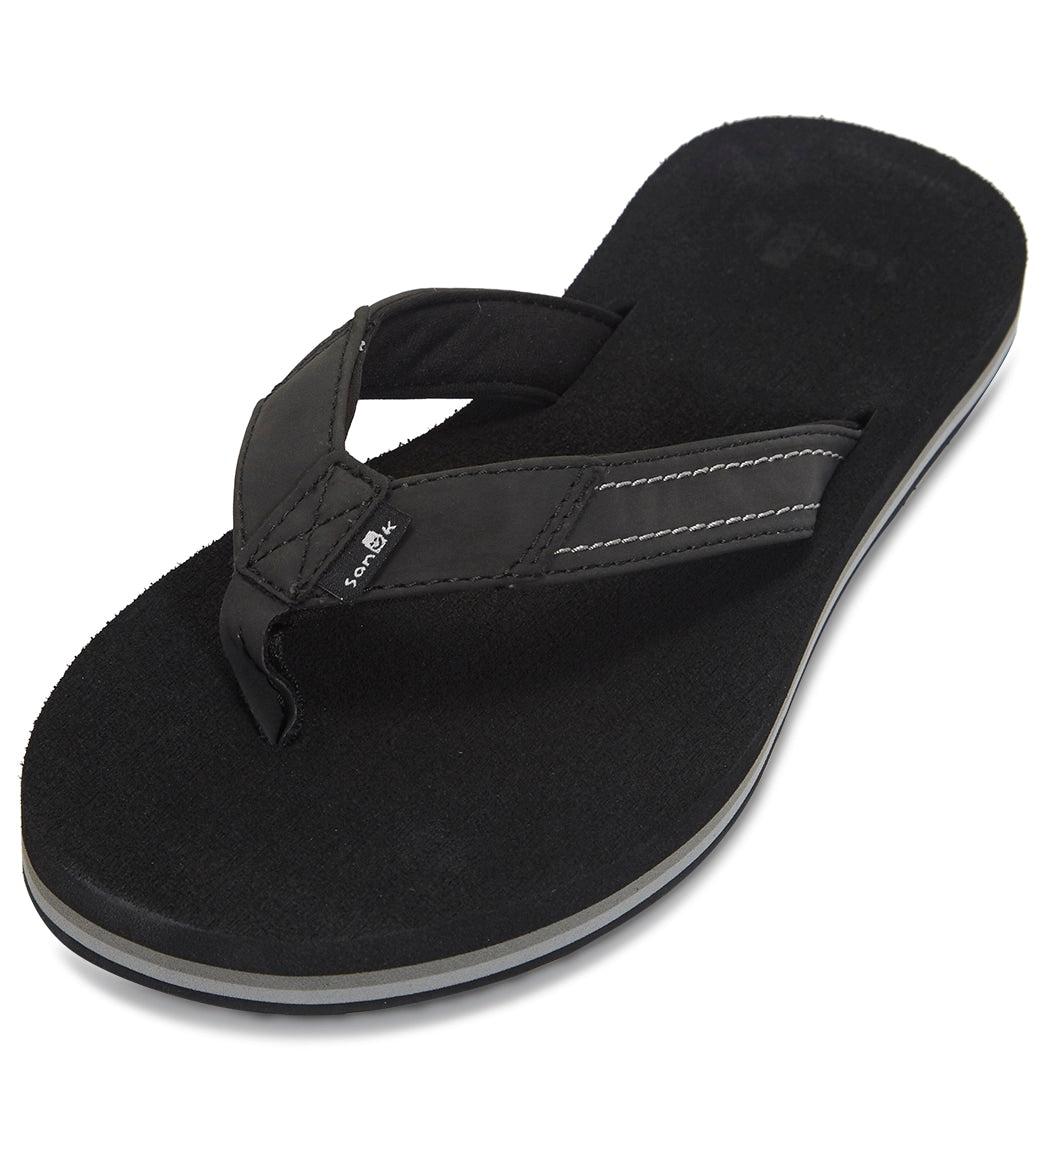 Sanuk Women's Yoga Mat Stacker Flip Flop - Black 10